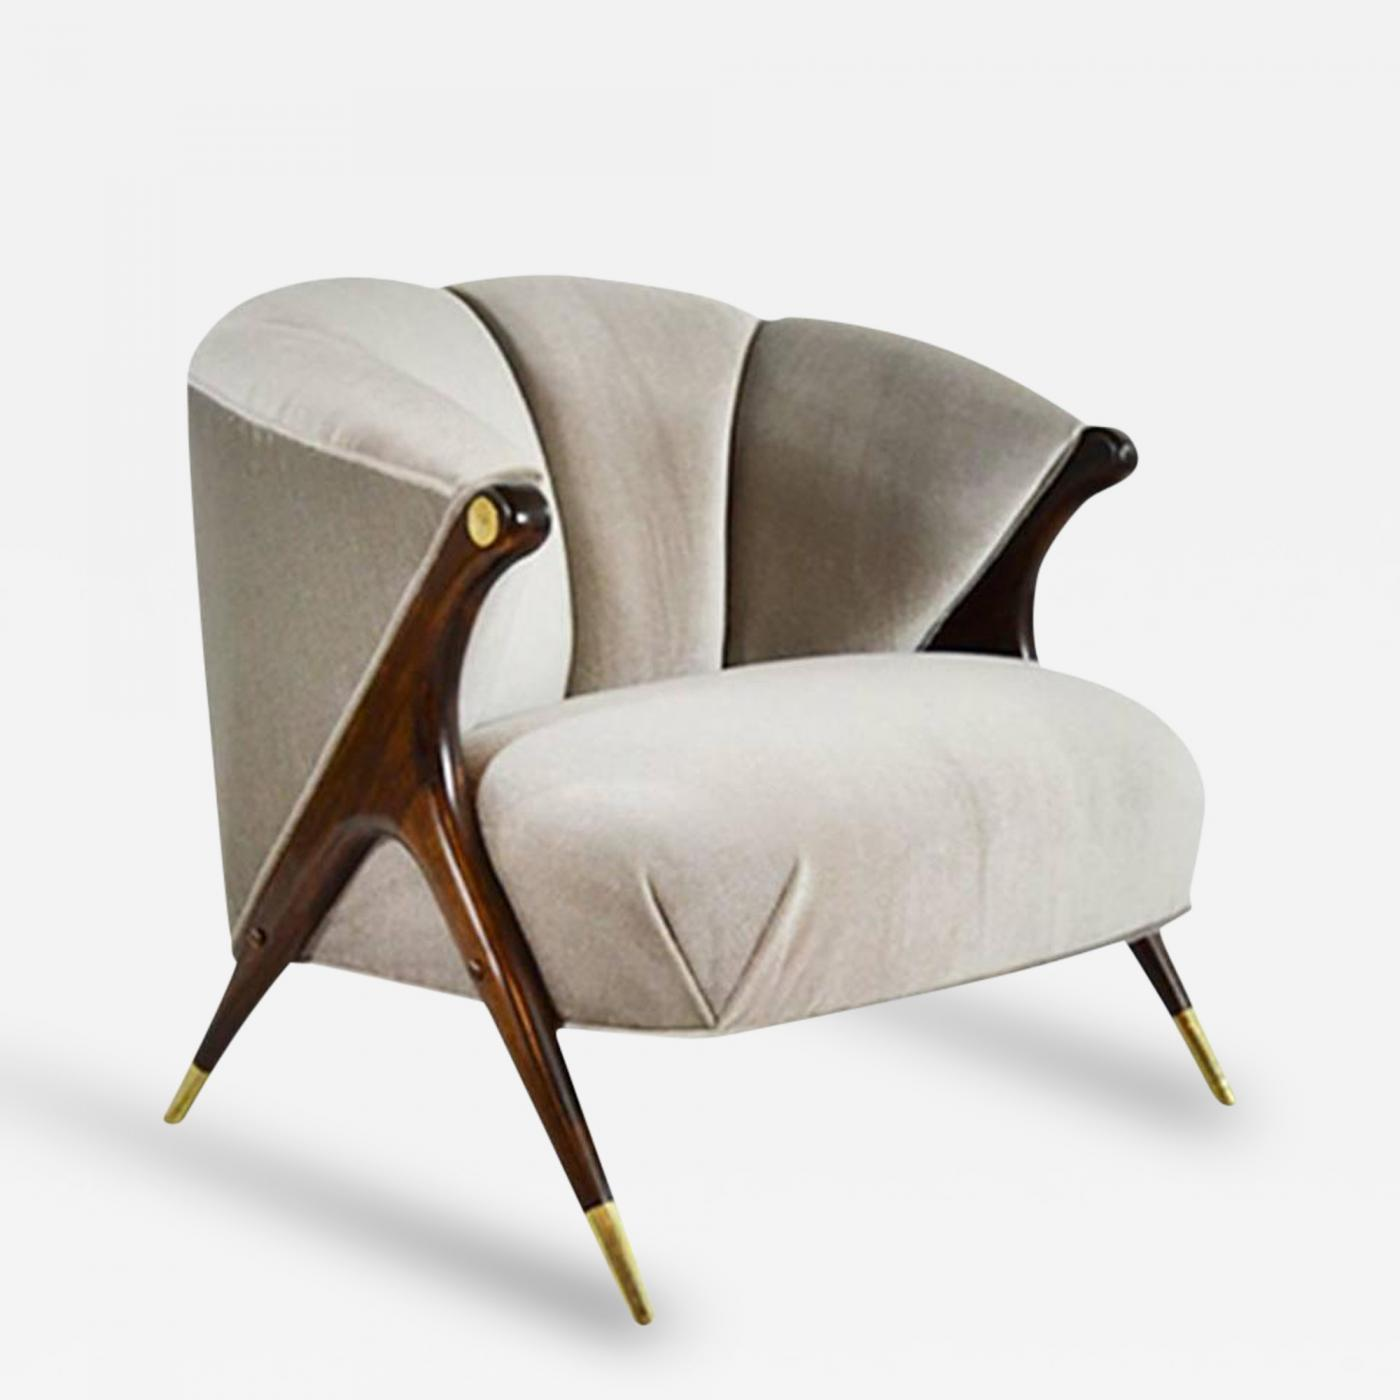 Karpen Of California Modernist Lounge Chair By Karpen Of